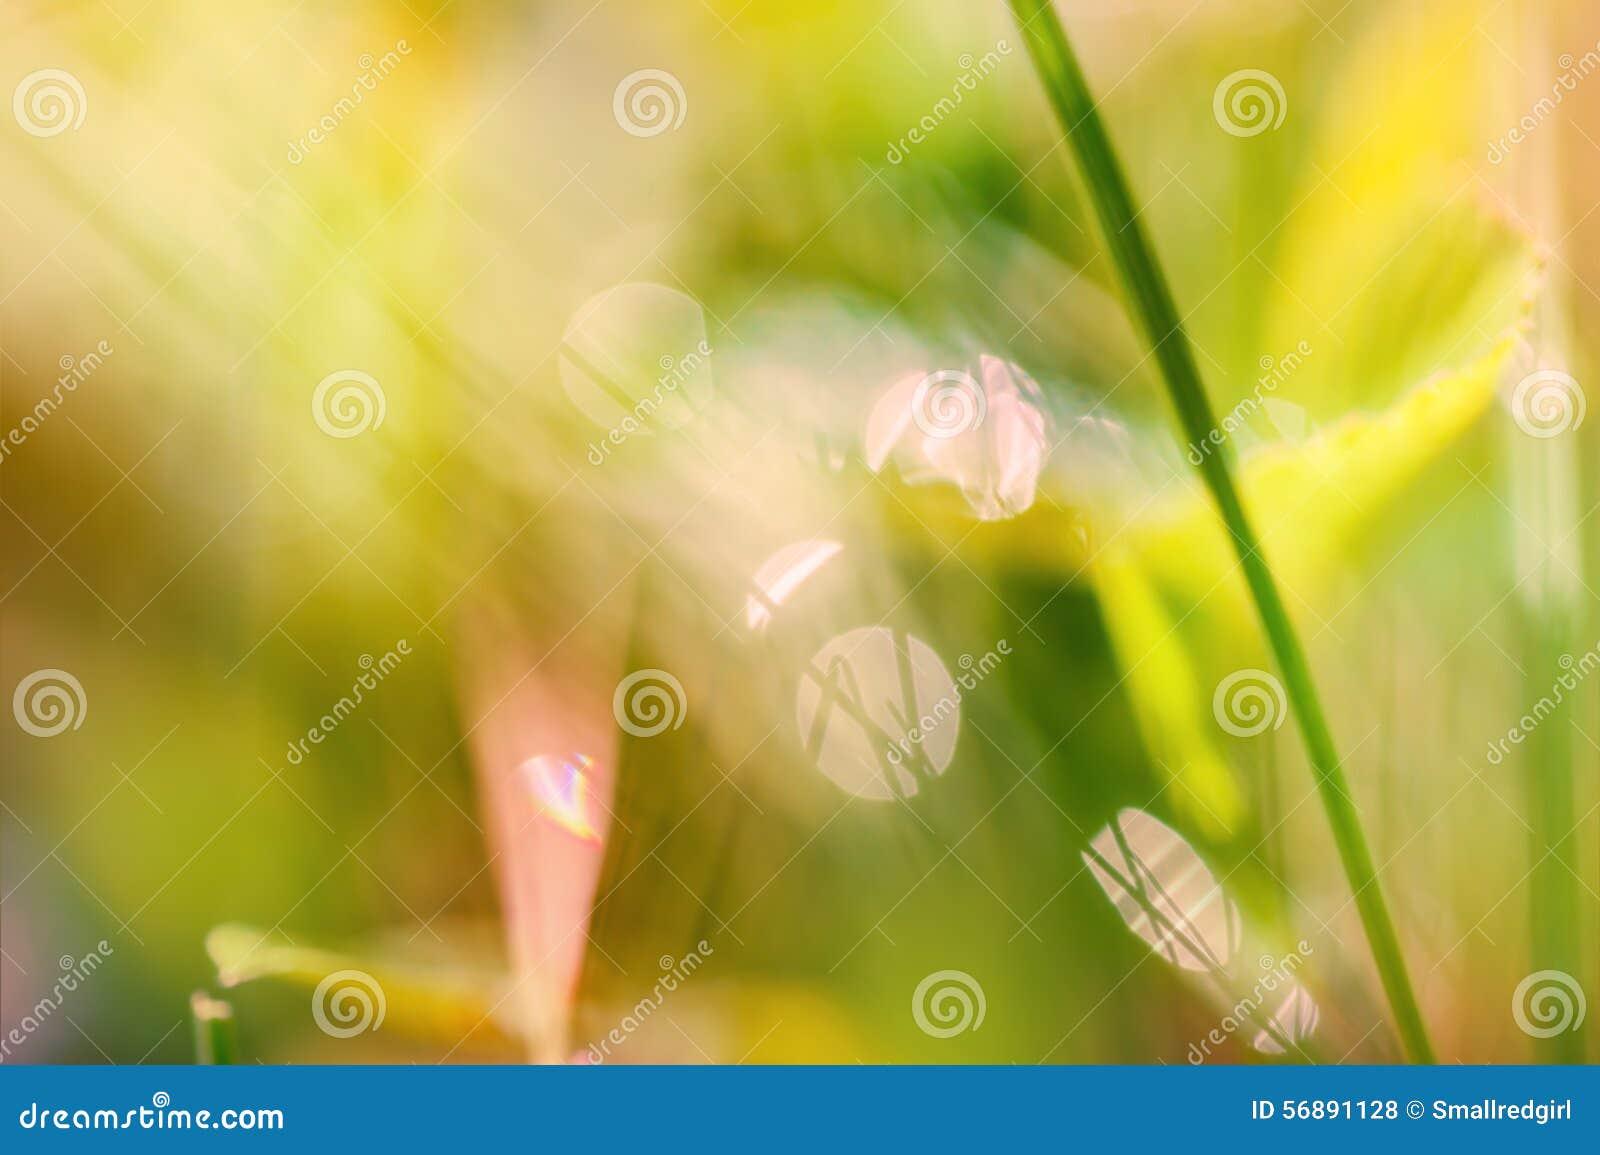 Fondo astratto vago con erba verde